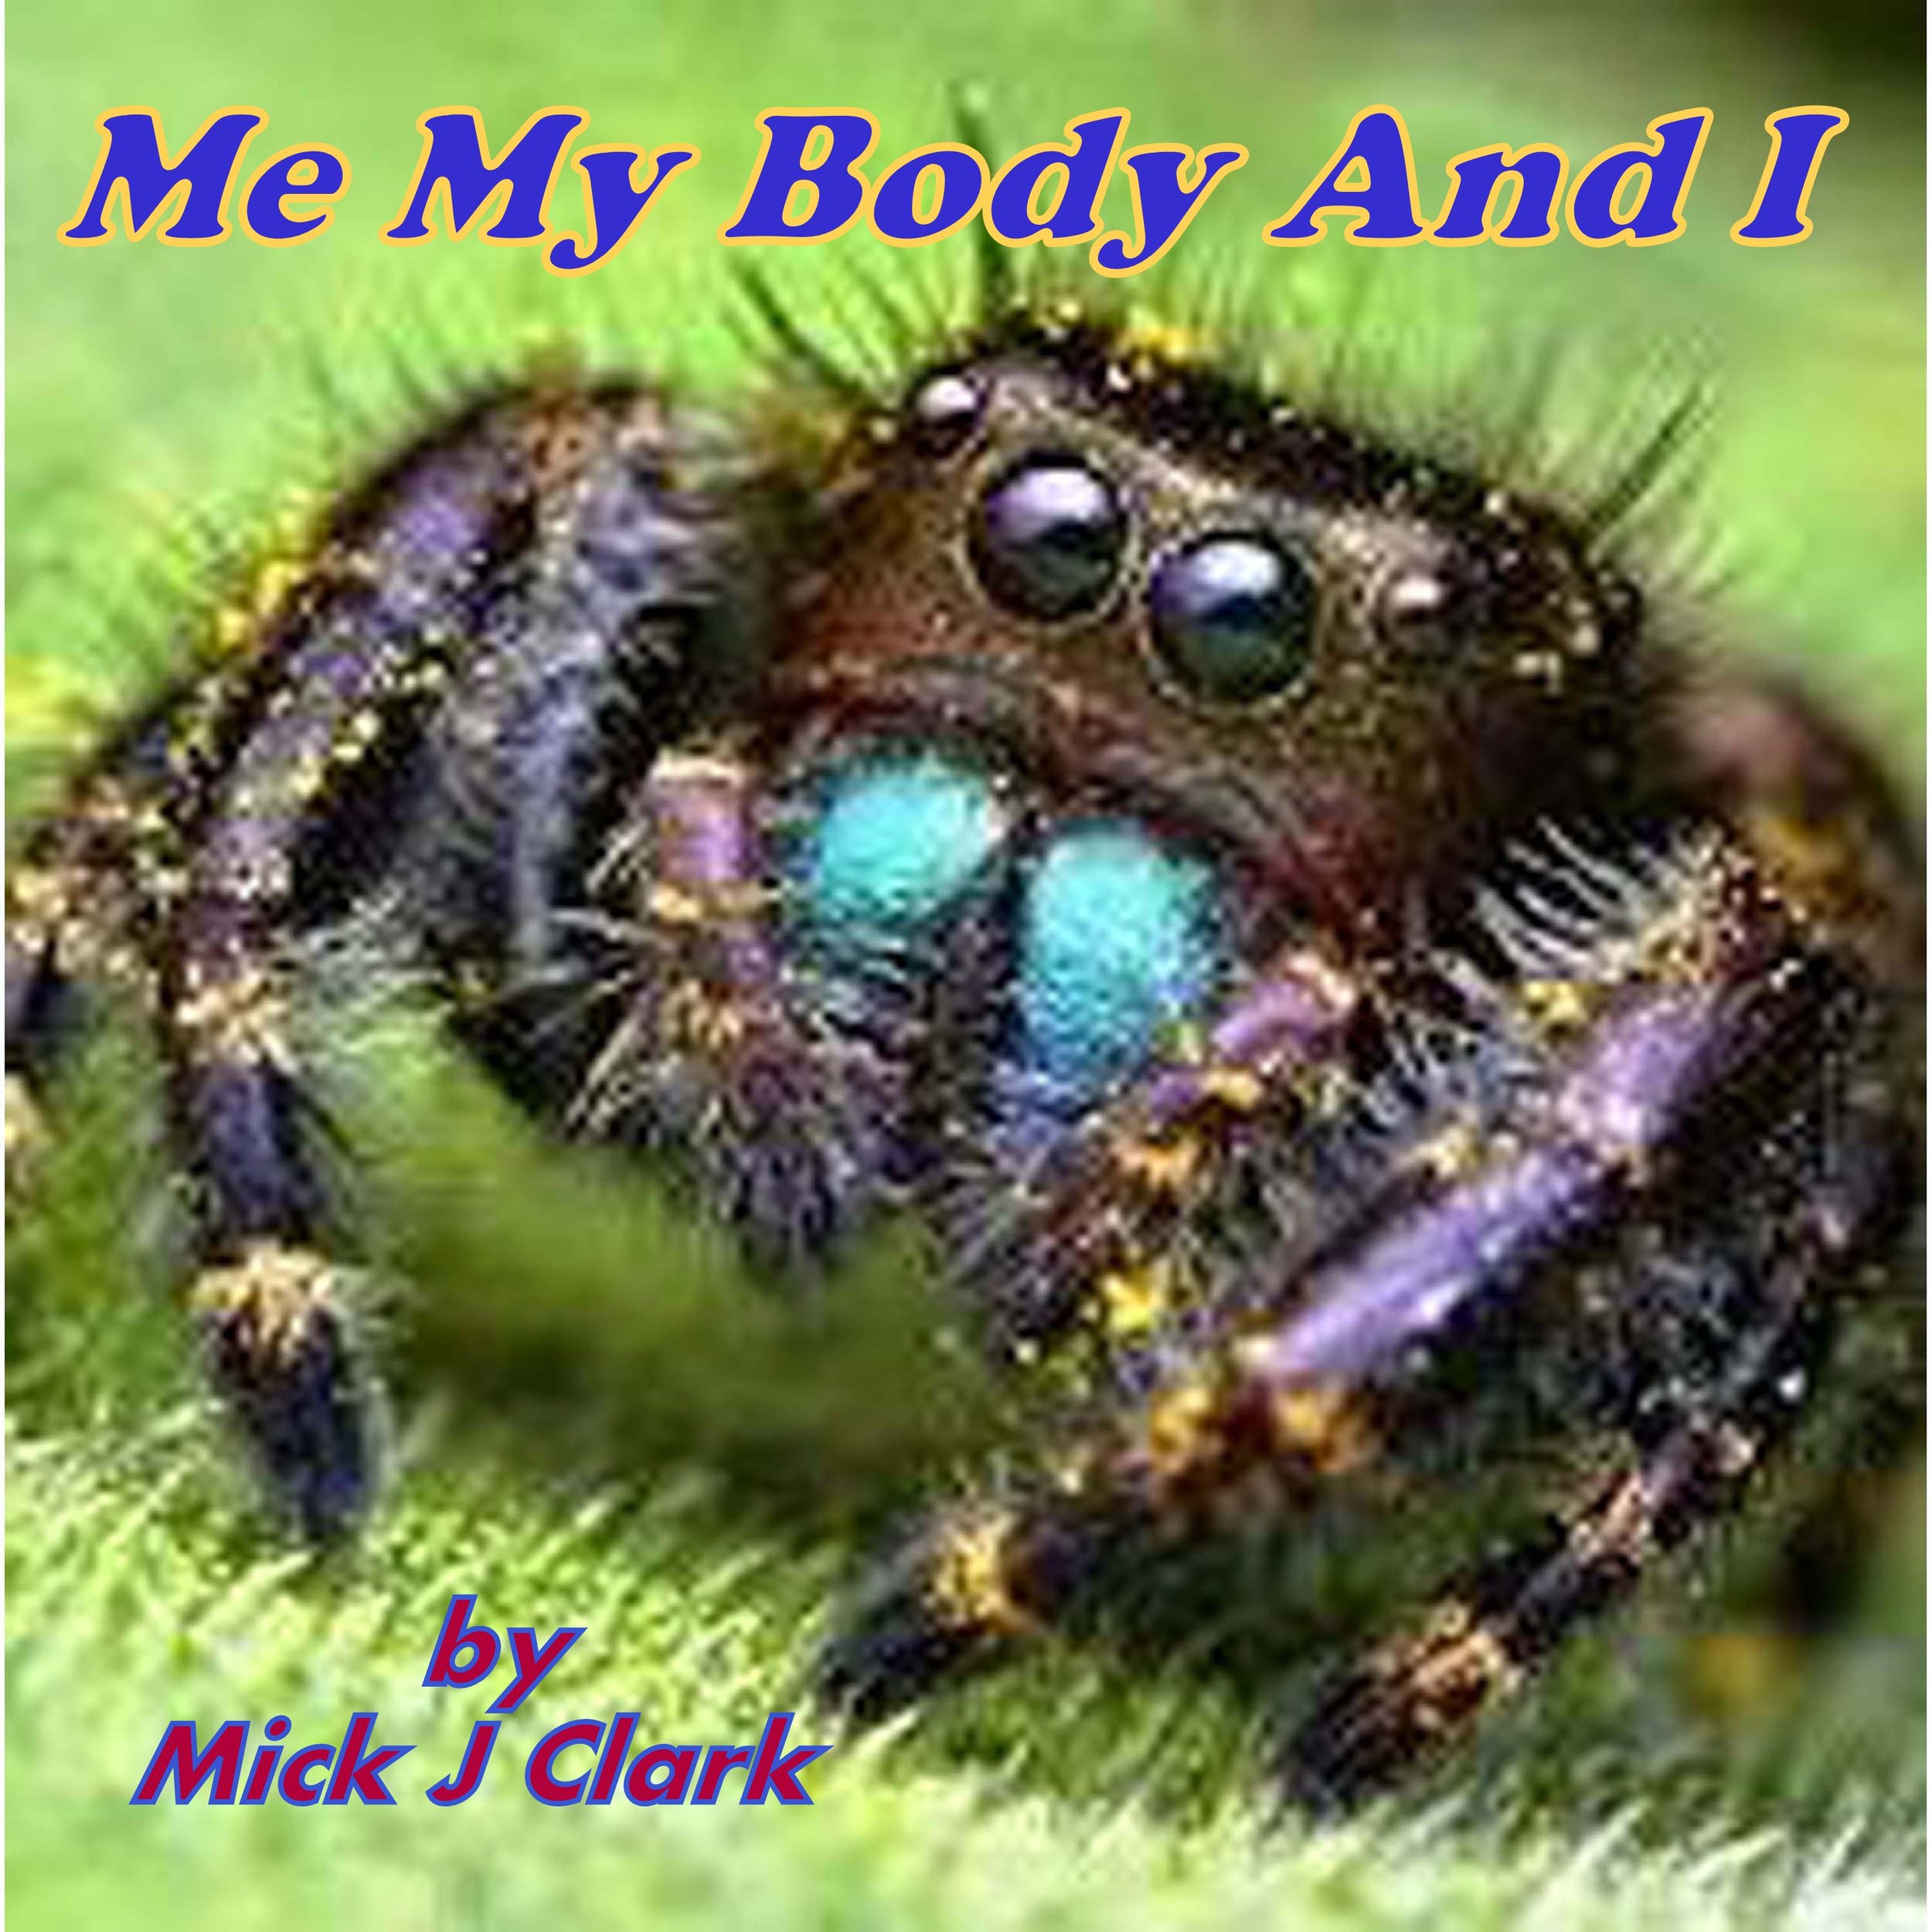 Mick j clark Me My Body And I.jpg